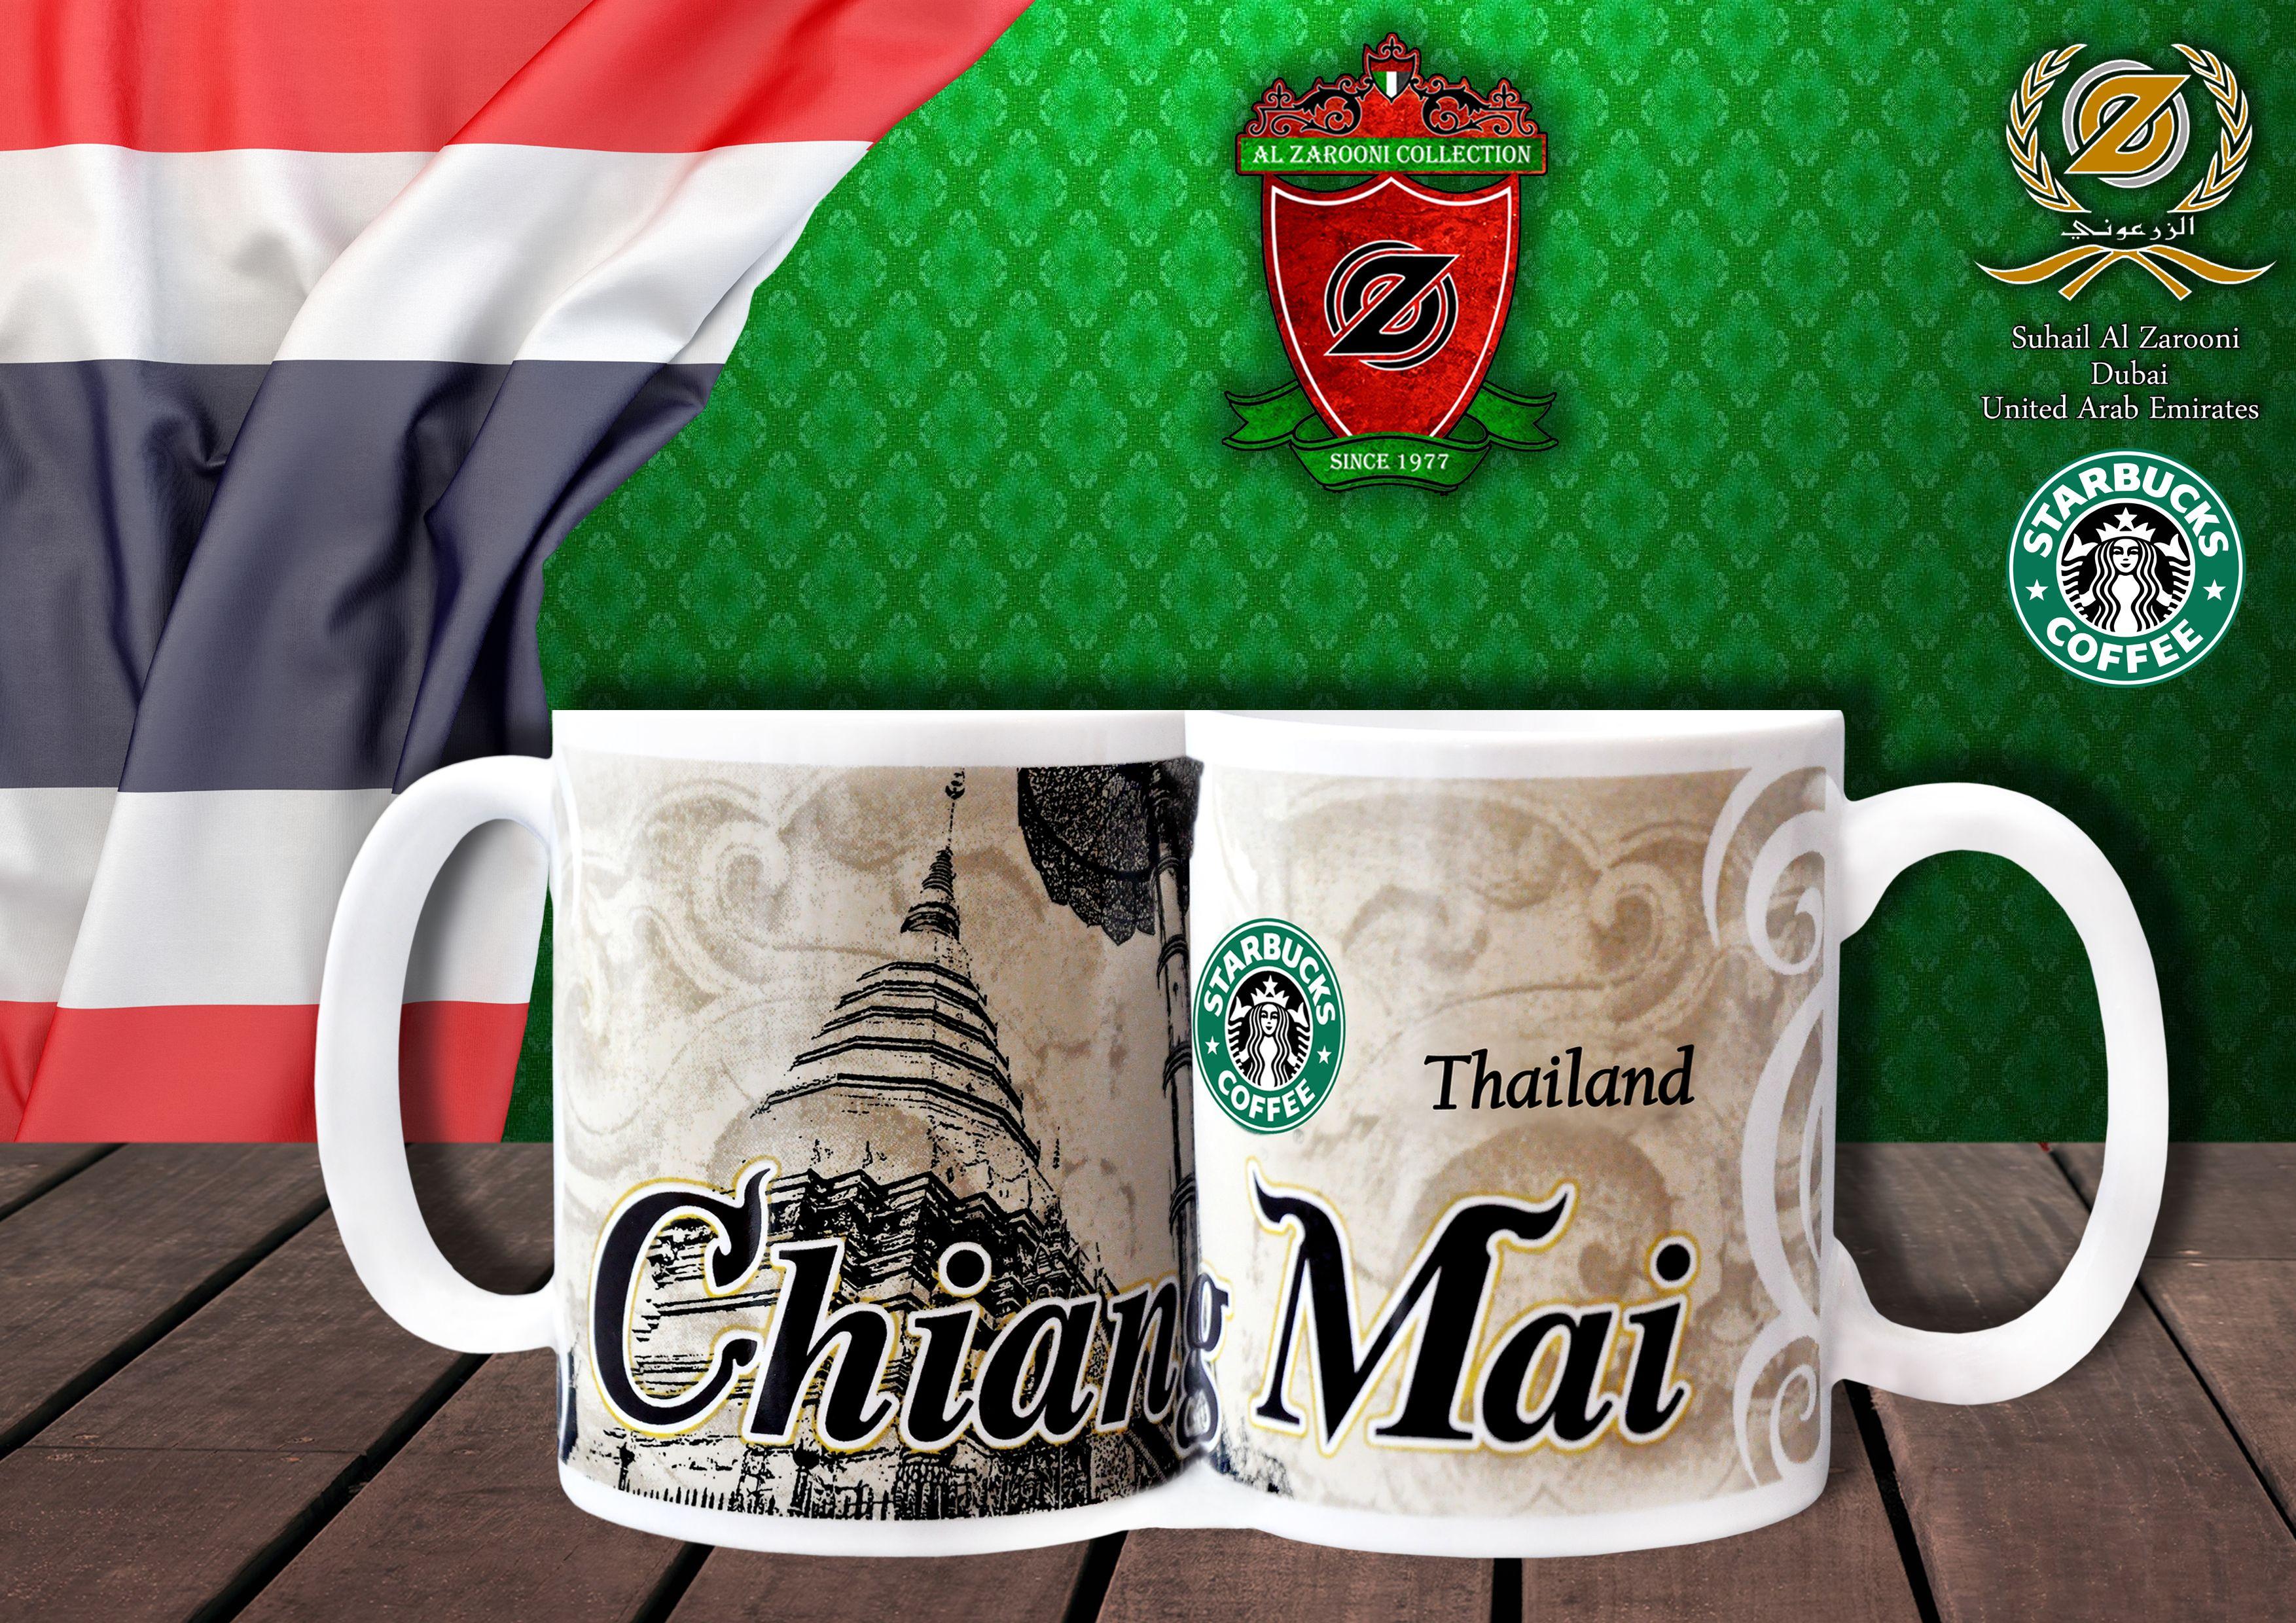 #Starbucks #Corporation # American #Coffee #Company #Coffeehouse #Cafe #Espresso CaffeLatte # ...